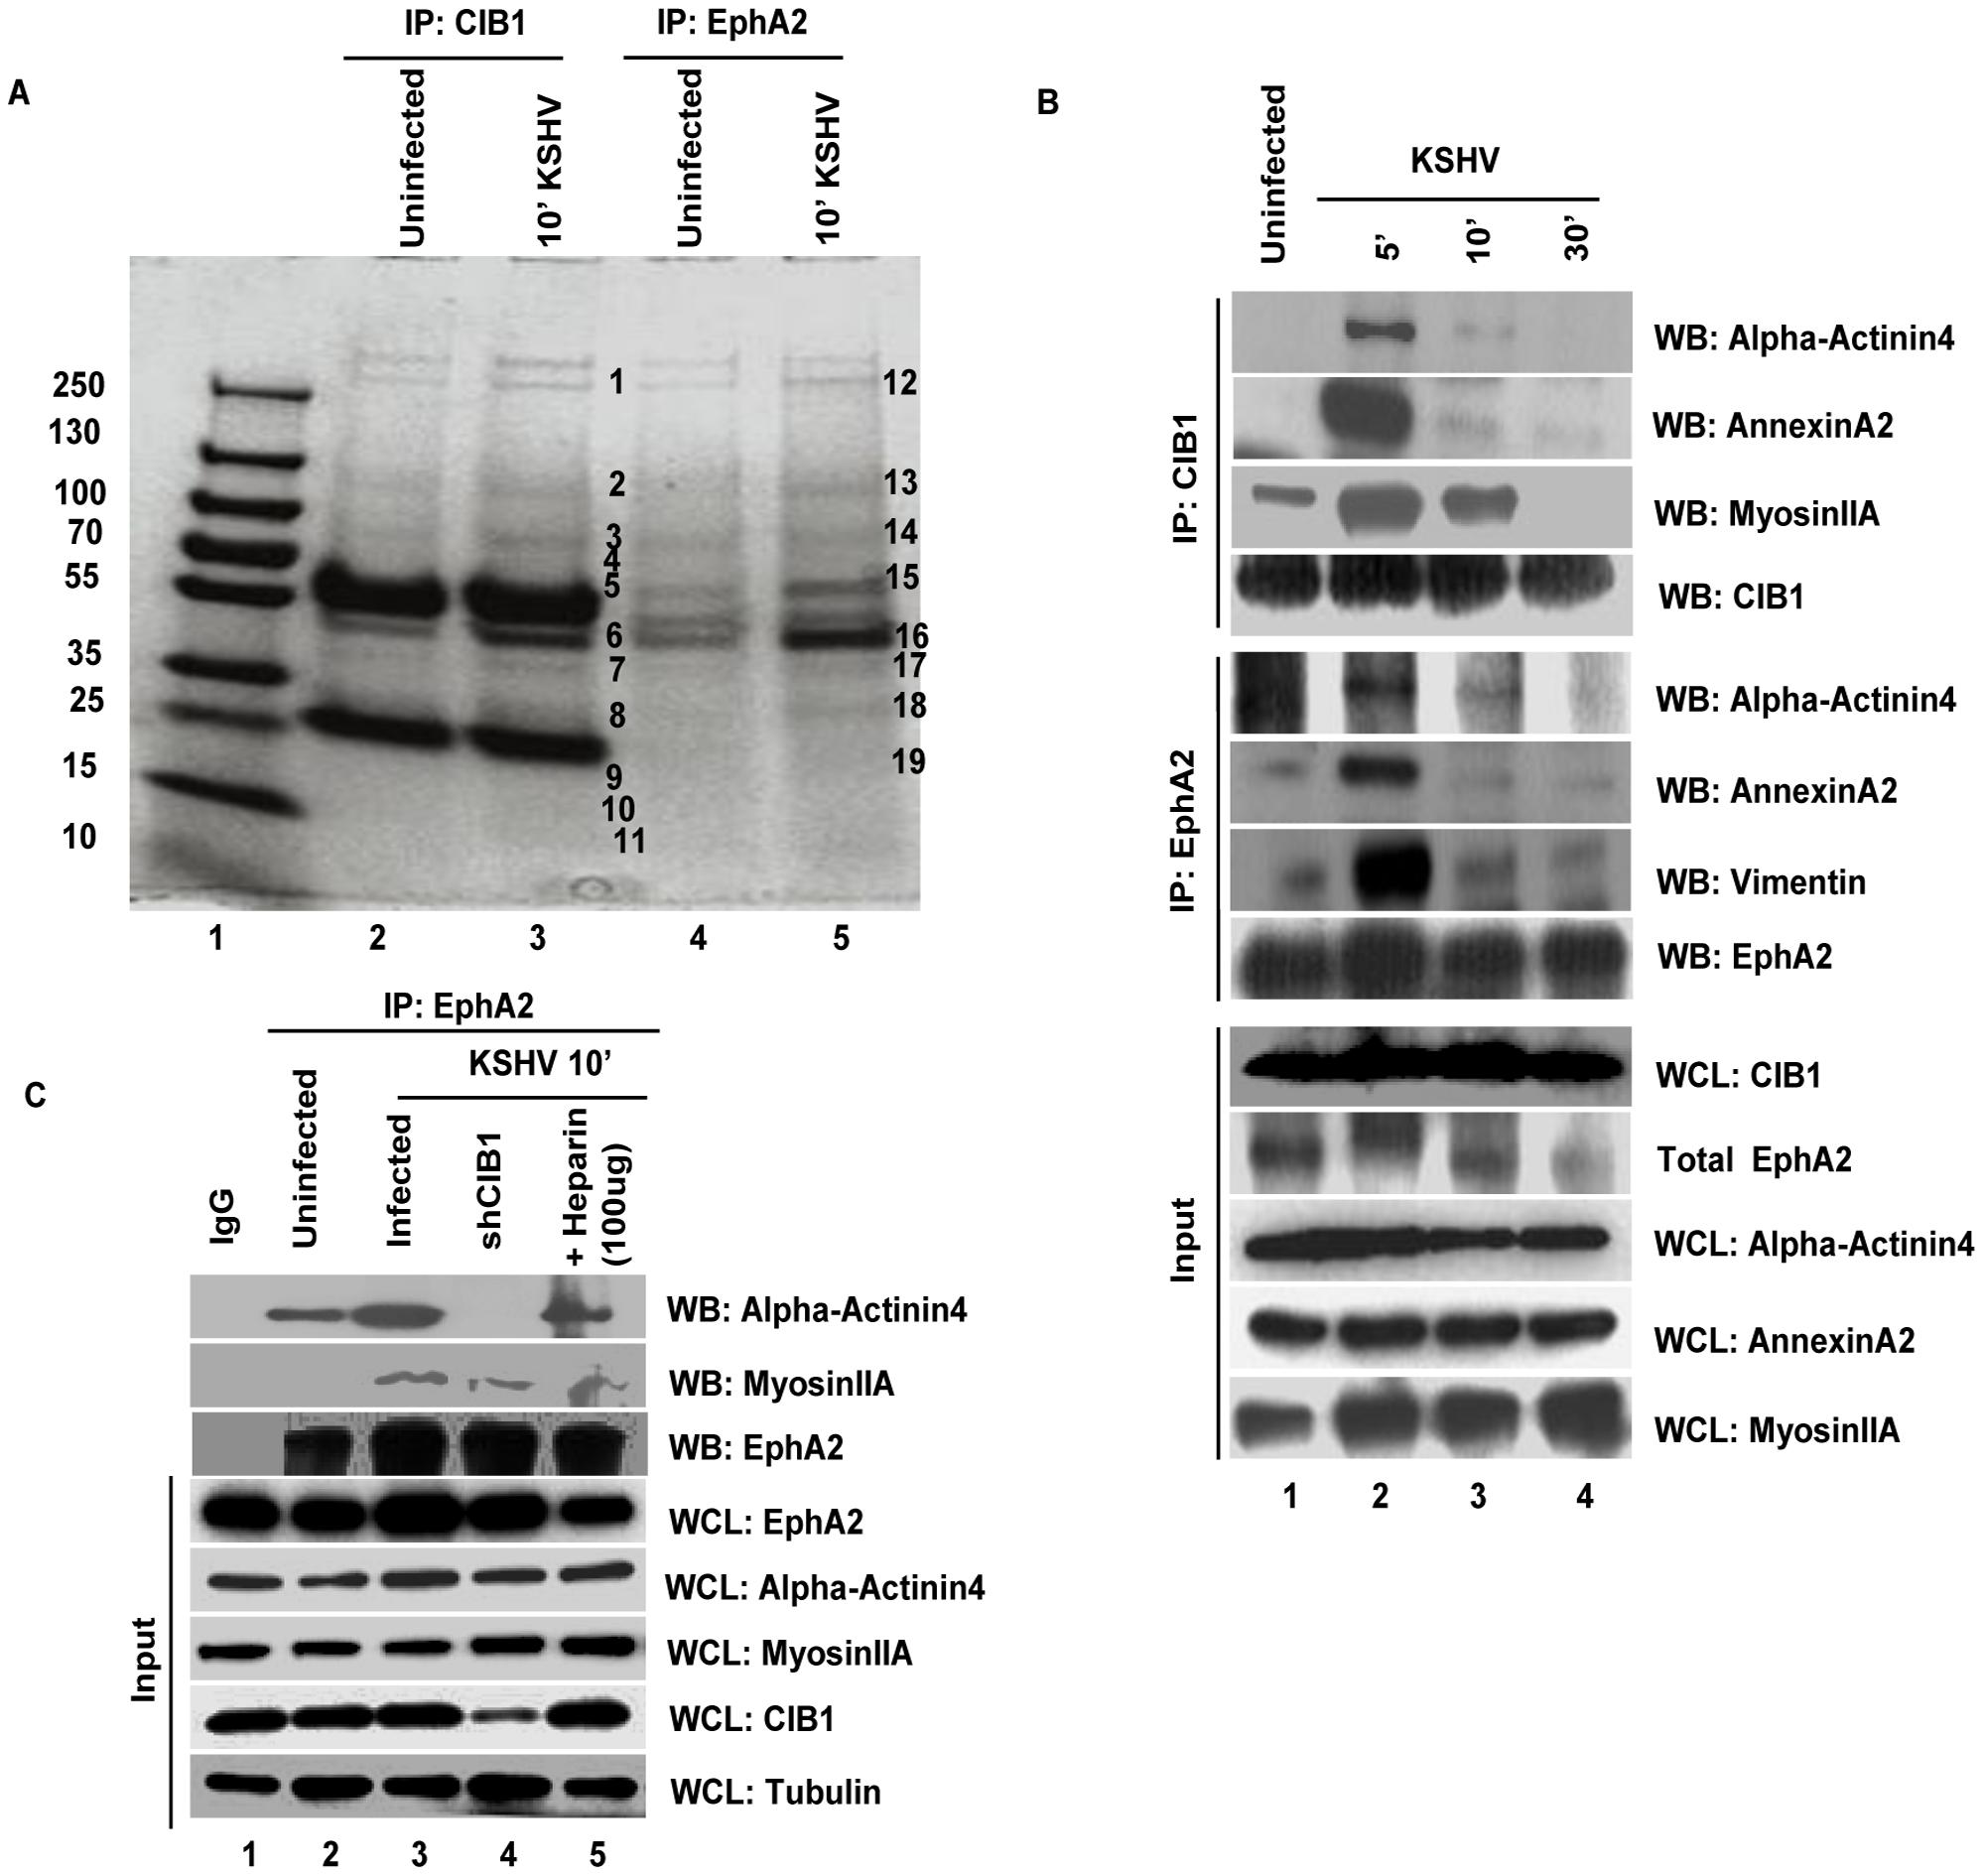 Mass spectrometric analysis of immunoprecipitates of anti-CIB1 and EphA2 antibodies with lysates from KSHV infected HMVEC-d cells.